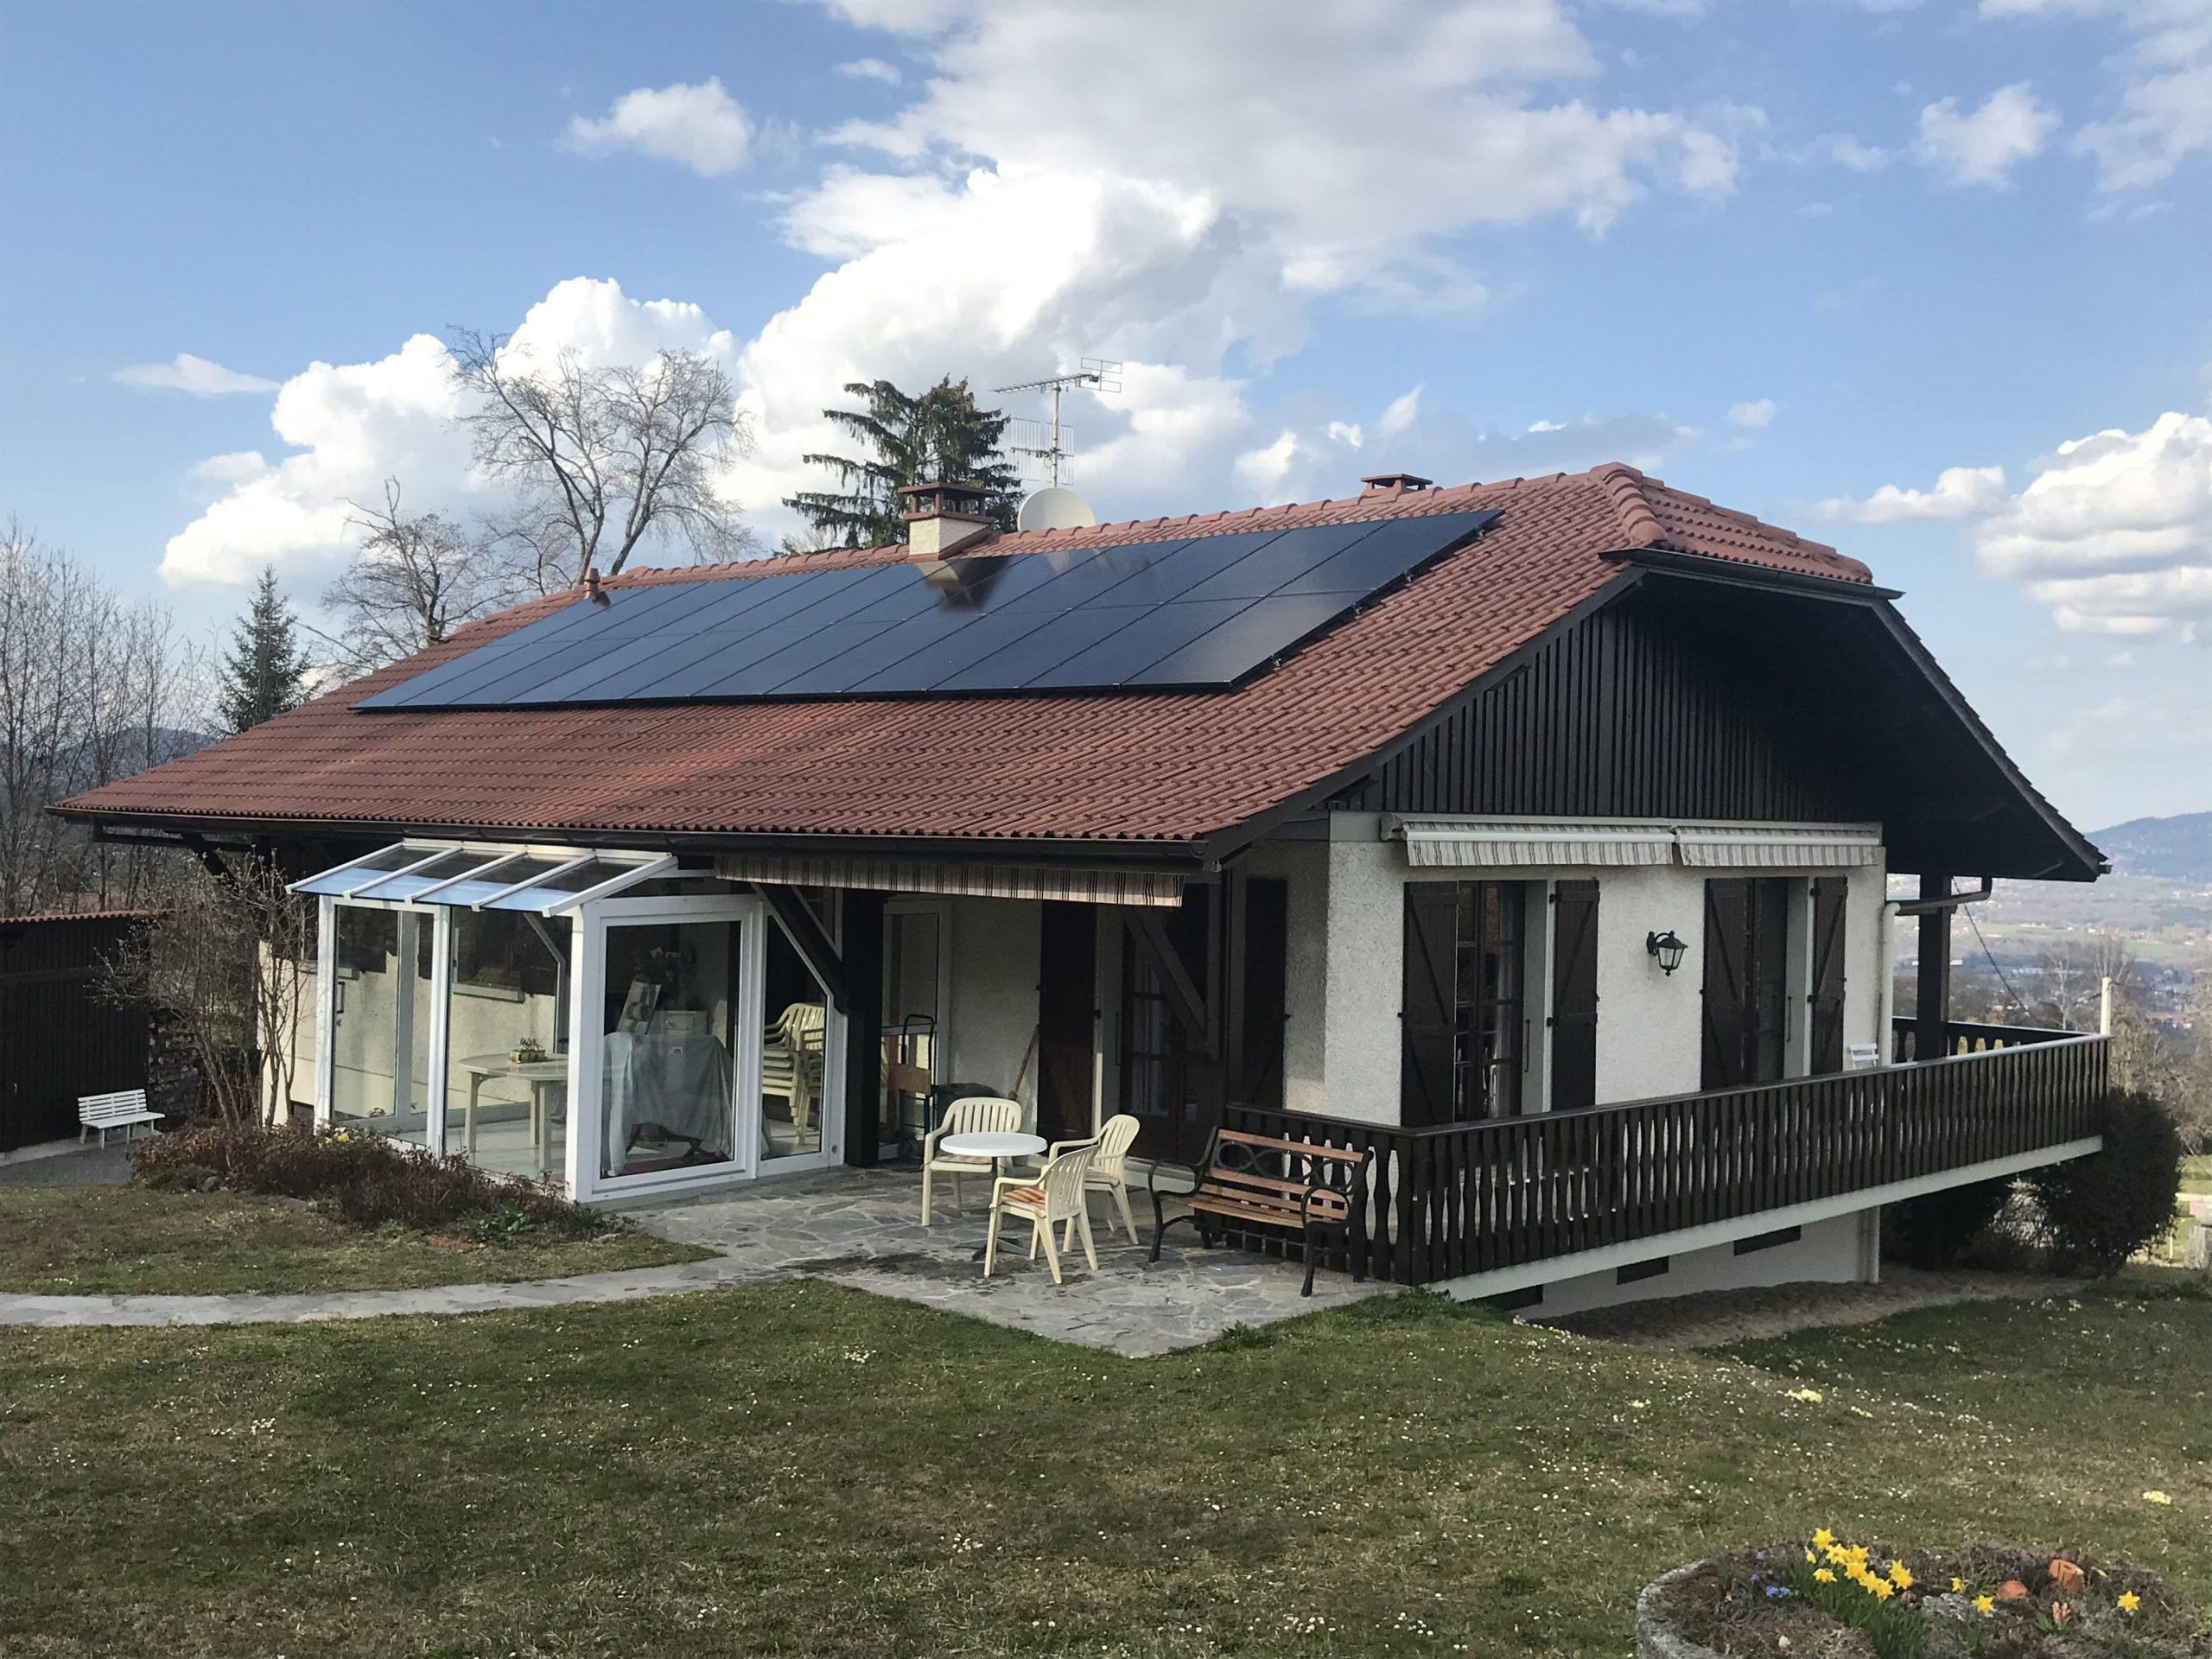 energies services france installation photovoltaique haute savoie pers jussy panneaux solaires autoconsommation